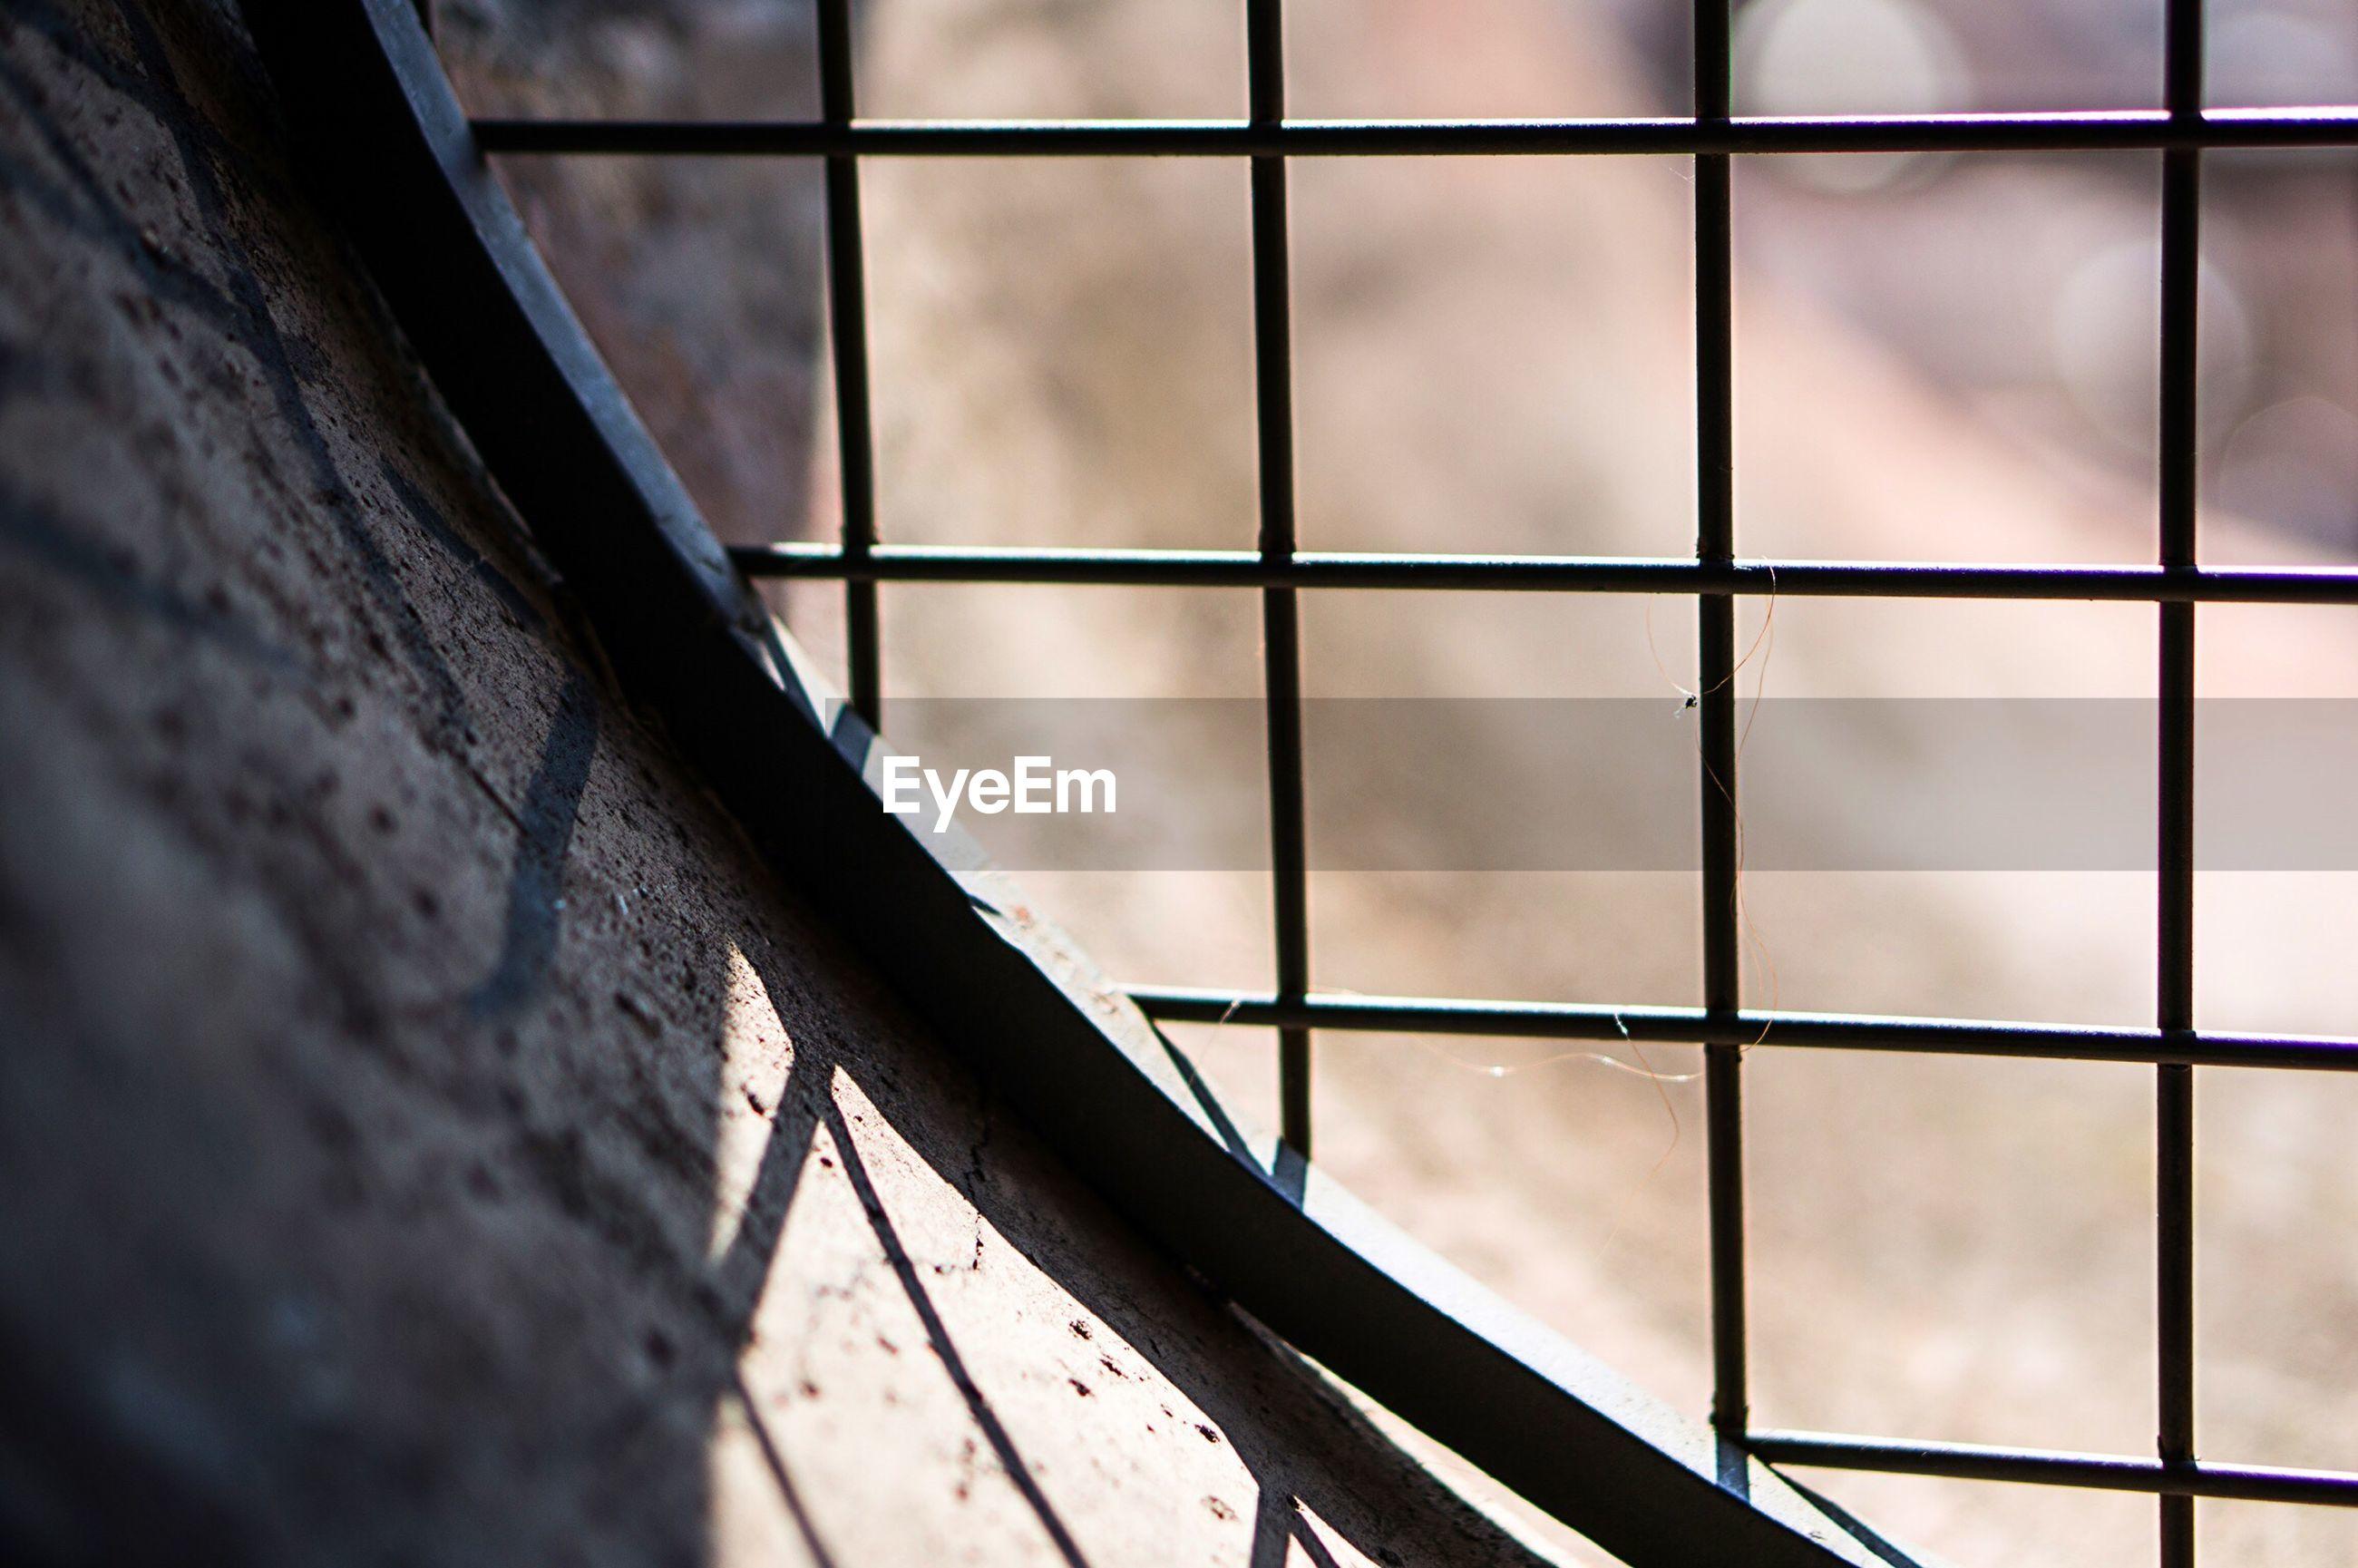 Close-up of window